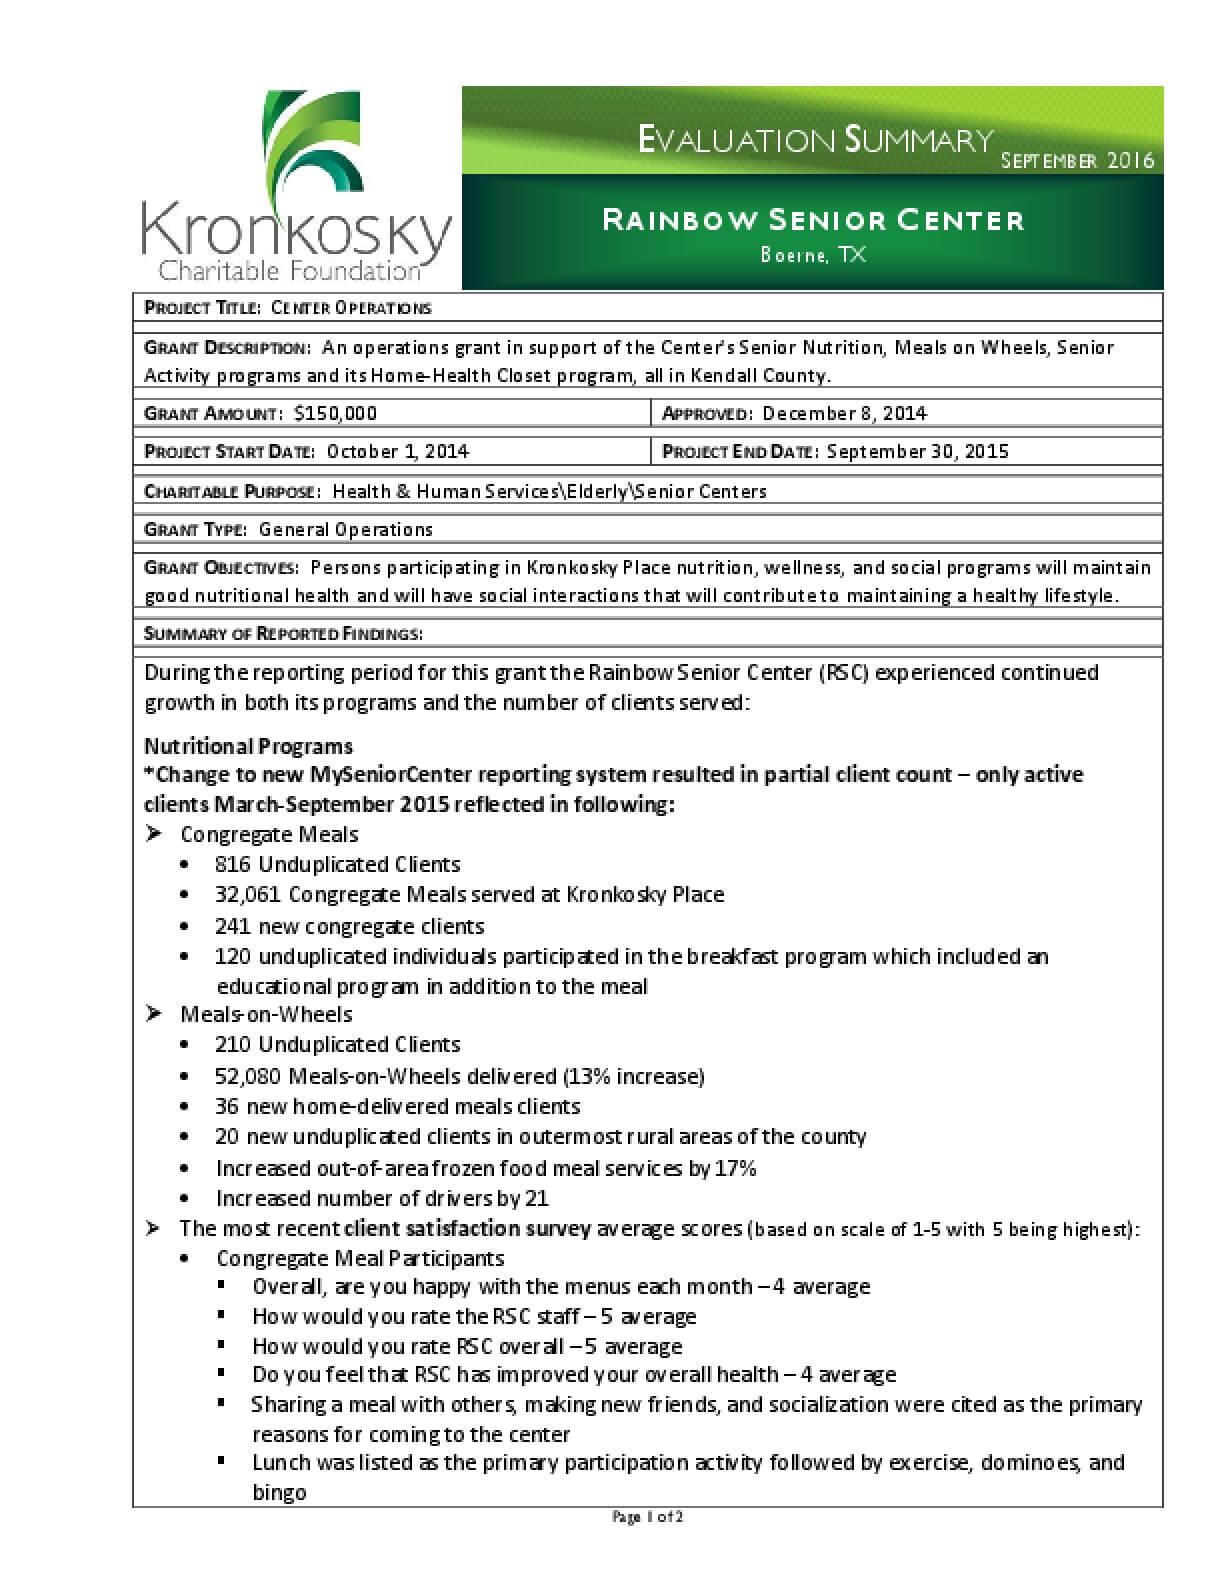 Rainbow Senior Center Evaluation Summary